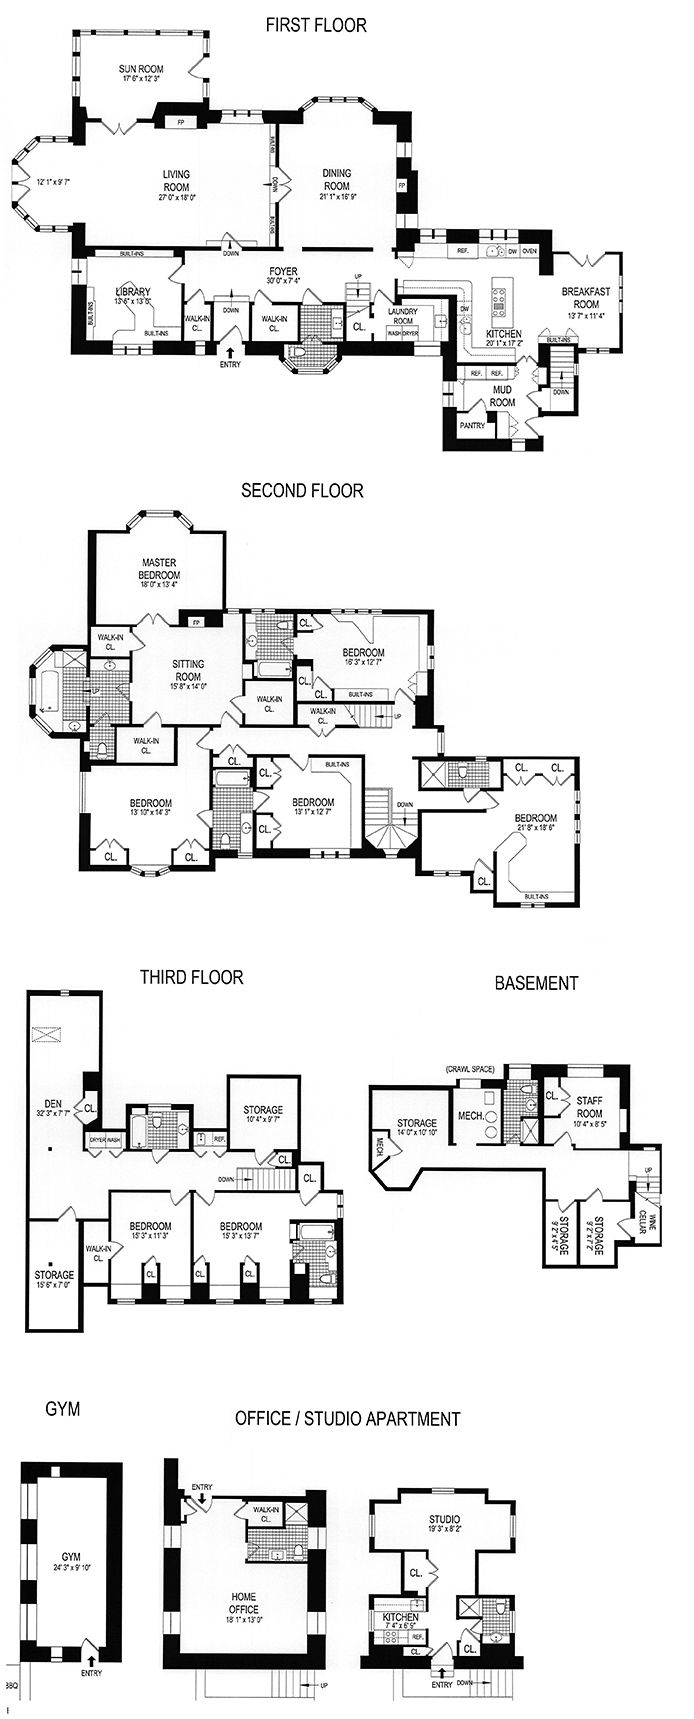 102 best townhouse floor plans images on pinterest floor plans in riverdale bronx